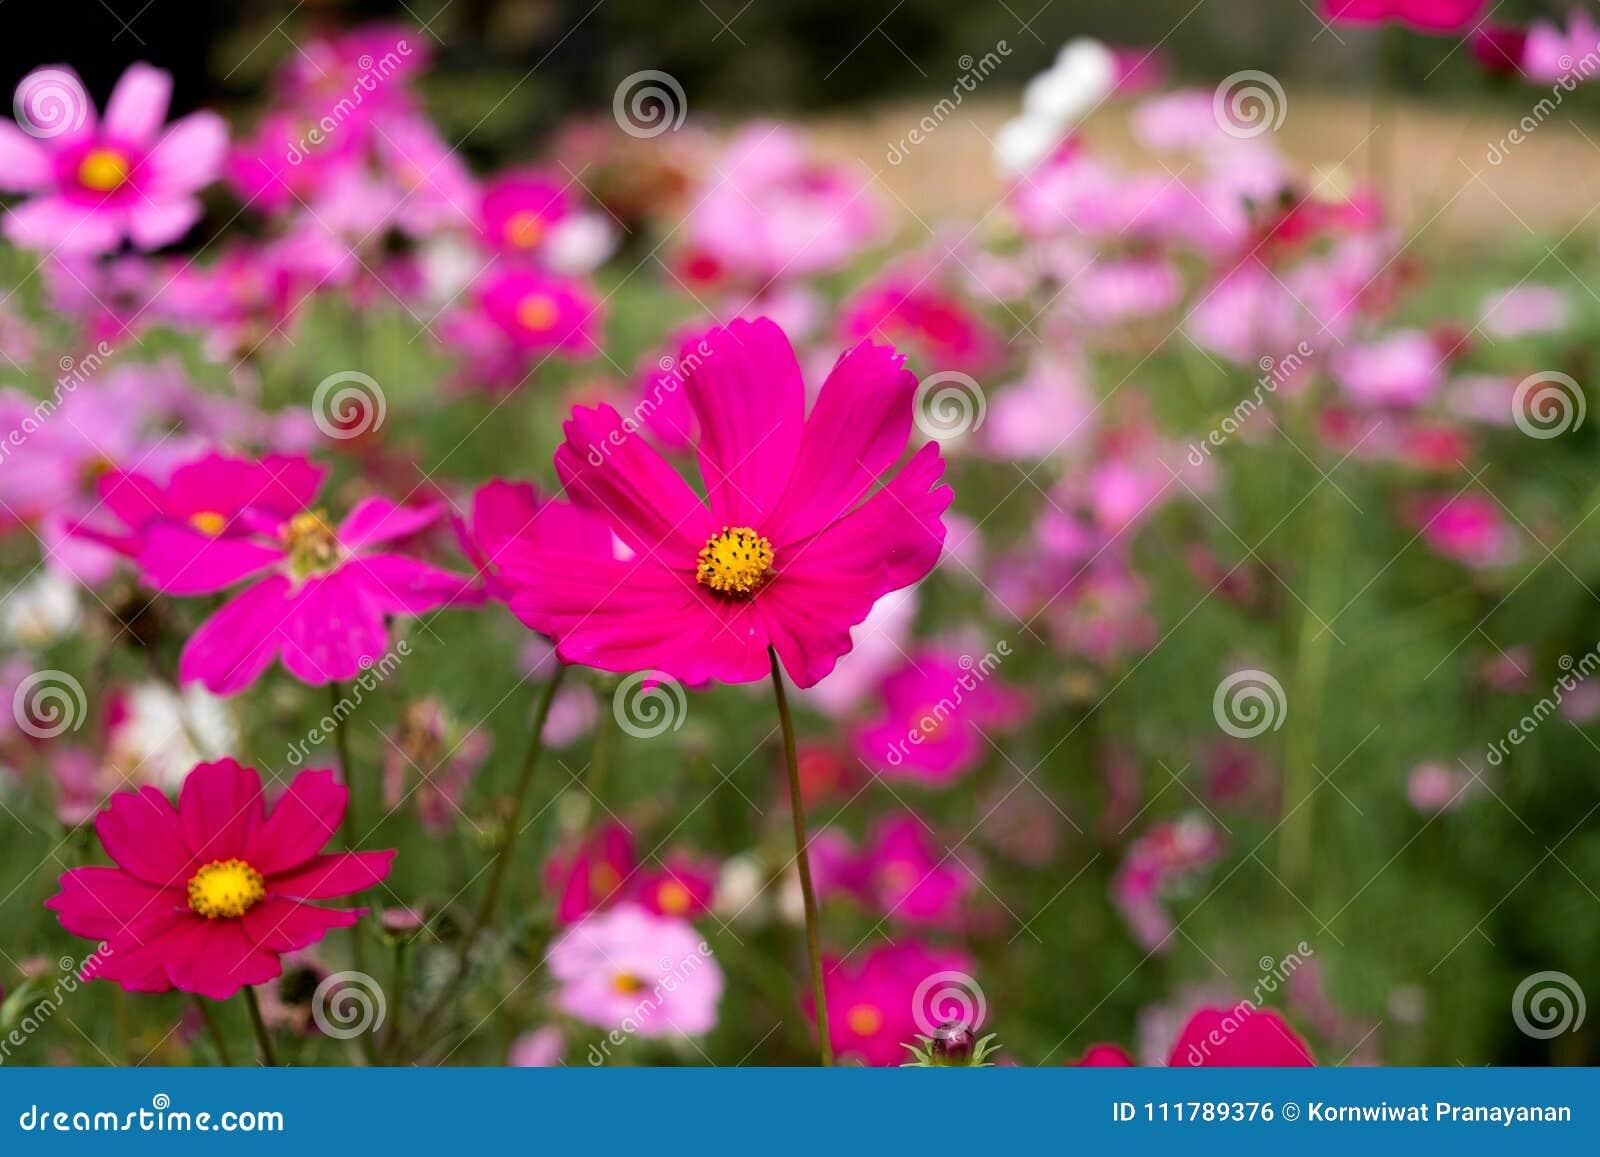 Cosmos flower in thailand stock photo image of simple 111789376 izmirmasajfo